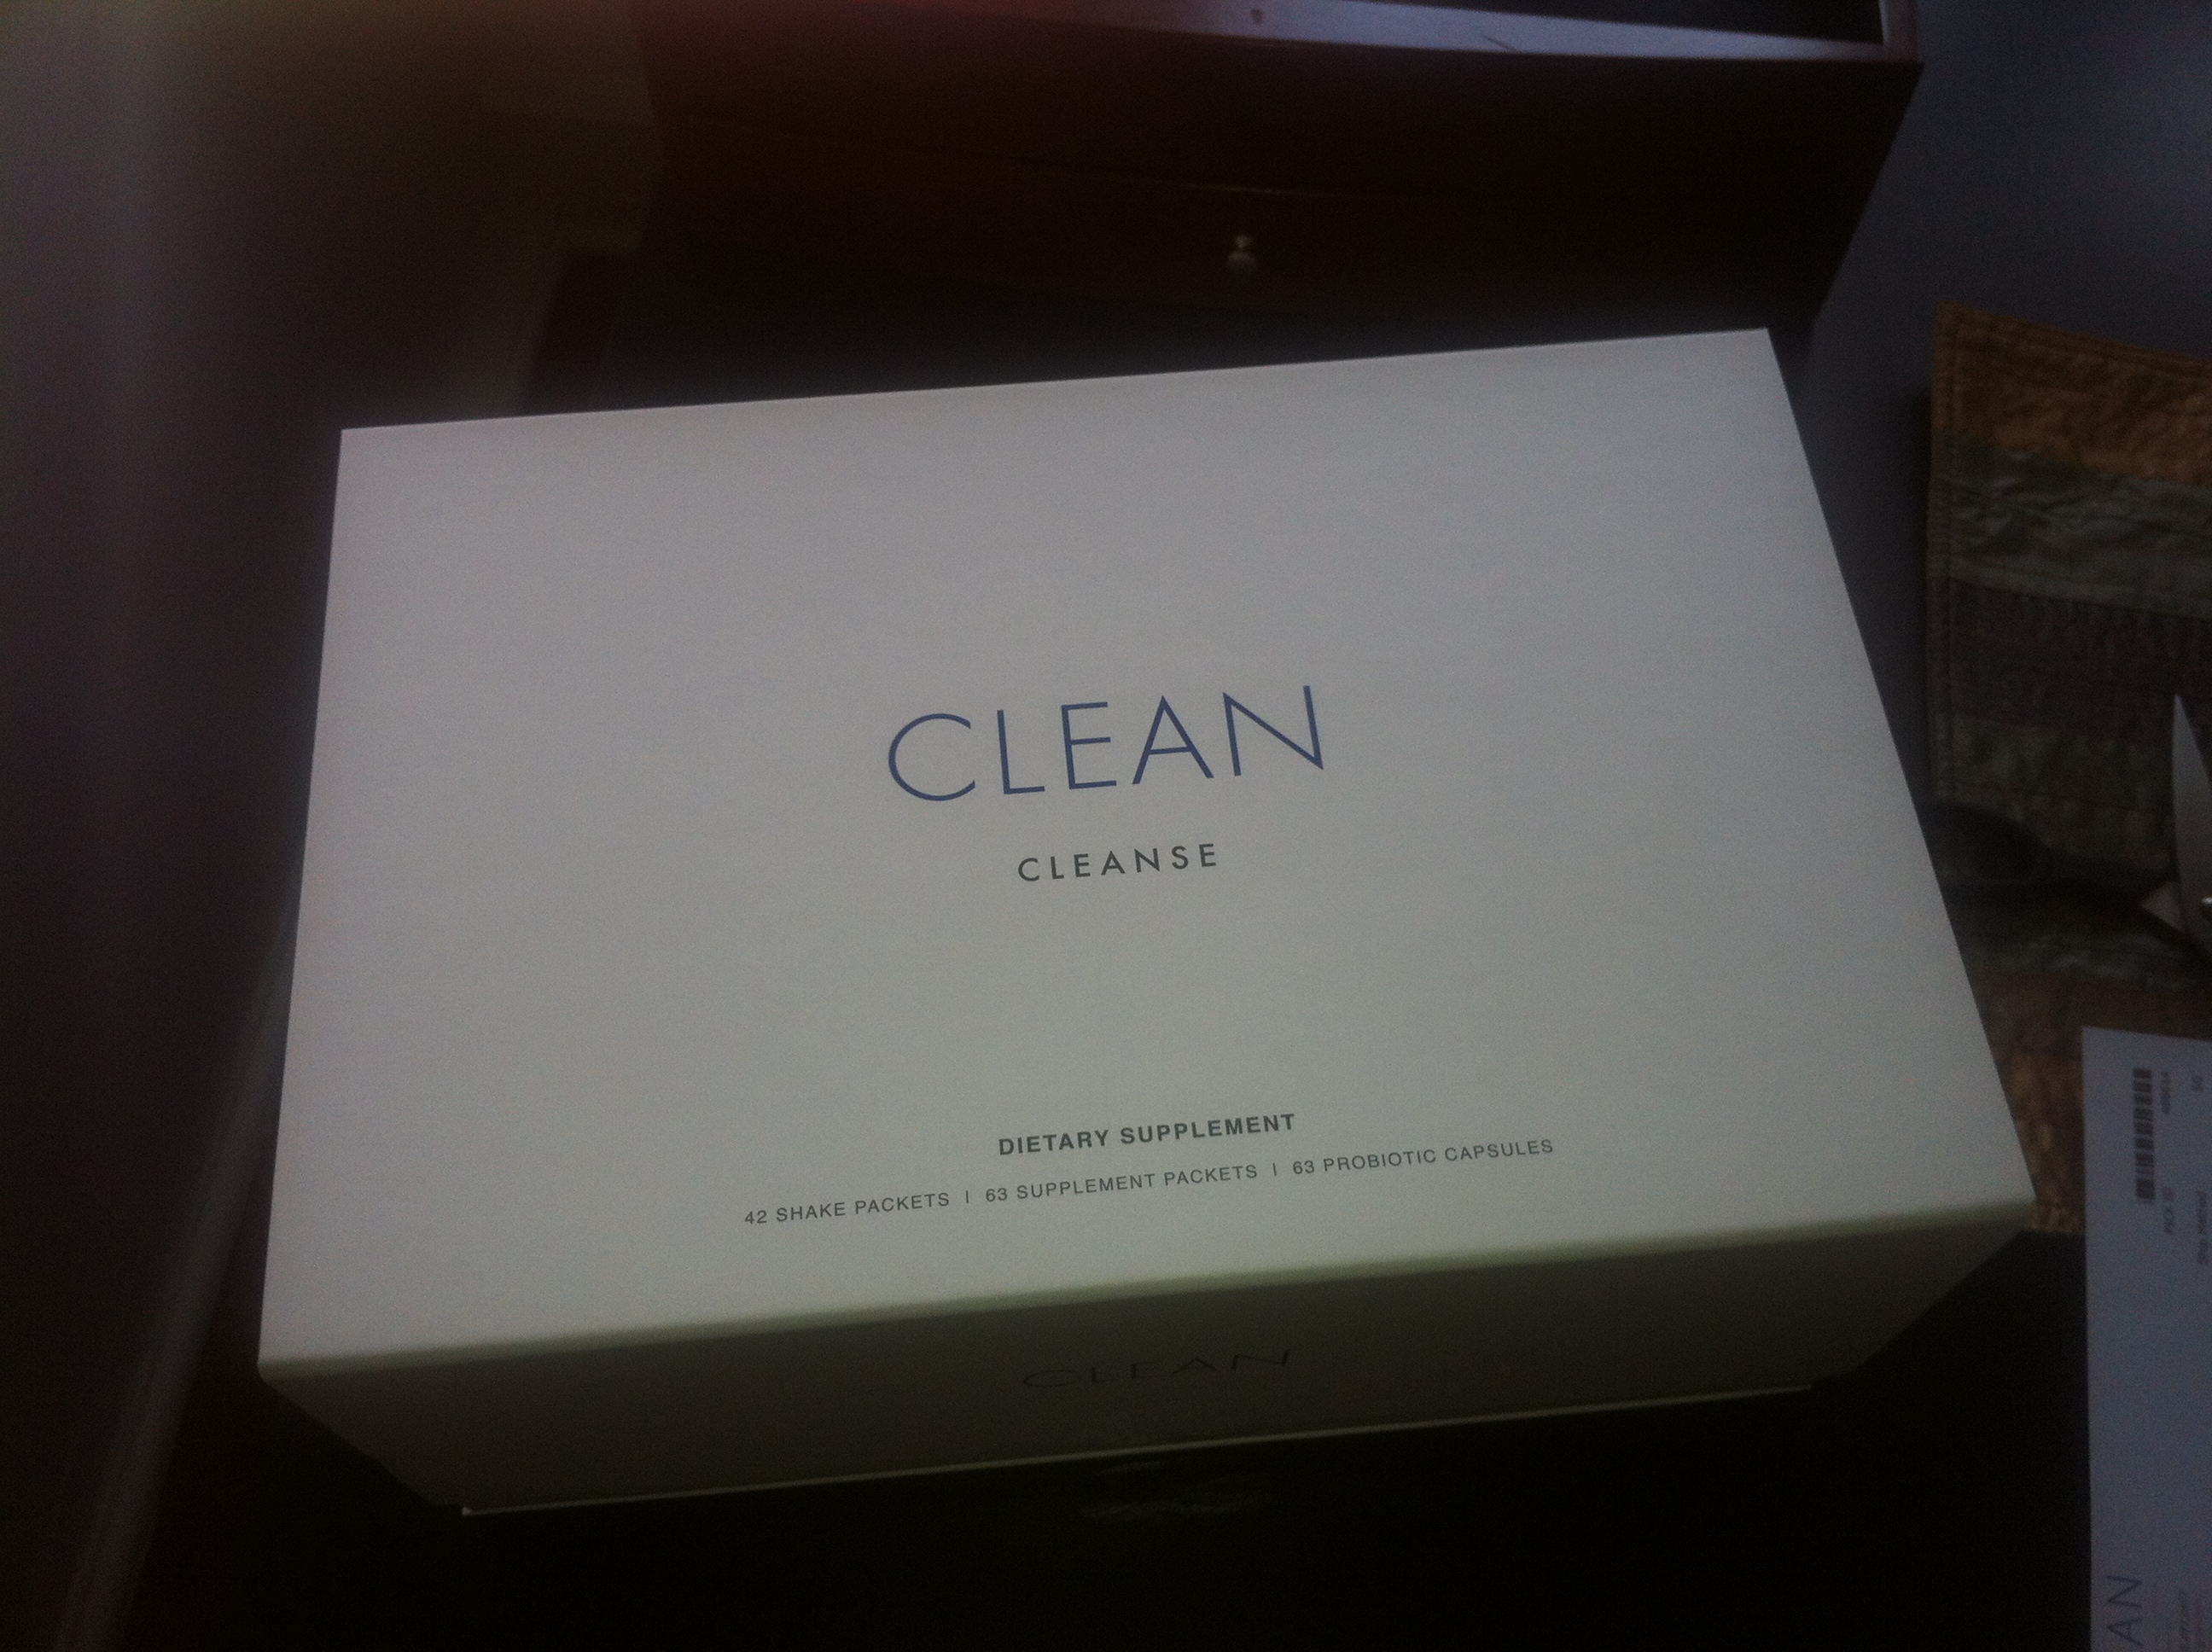 image - Clean Box